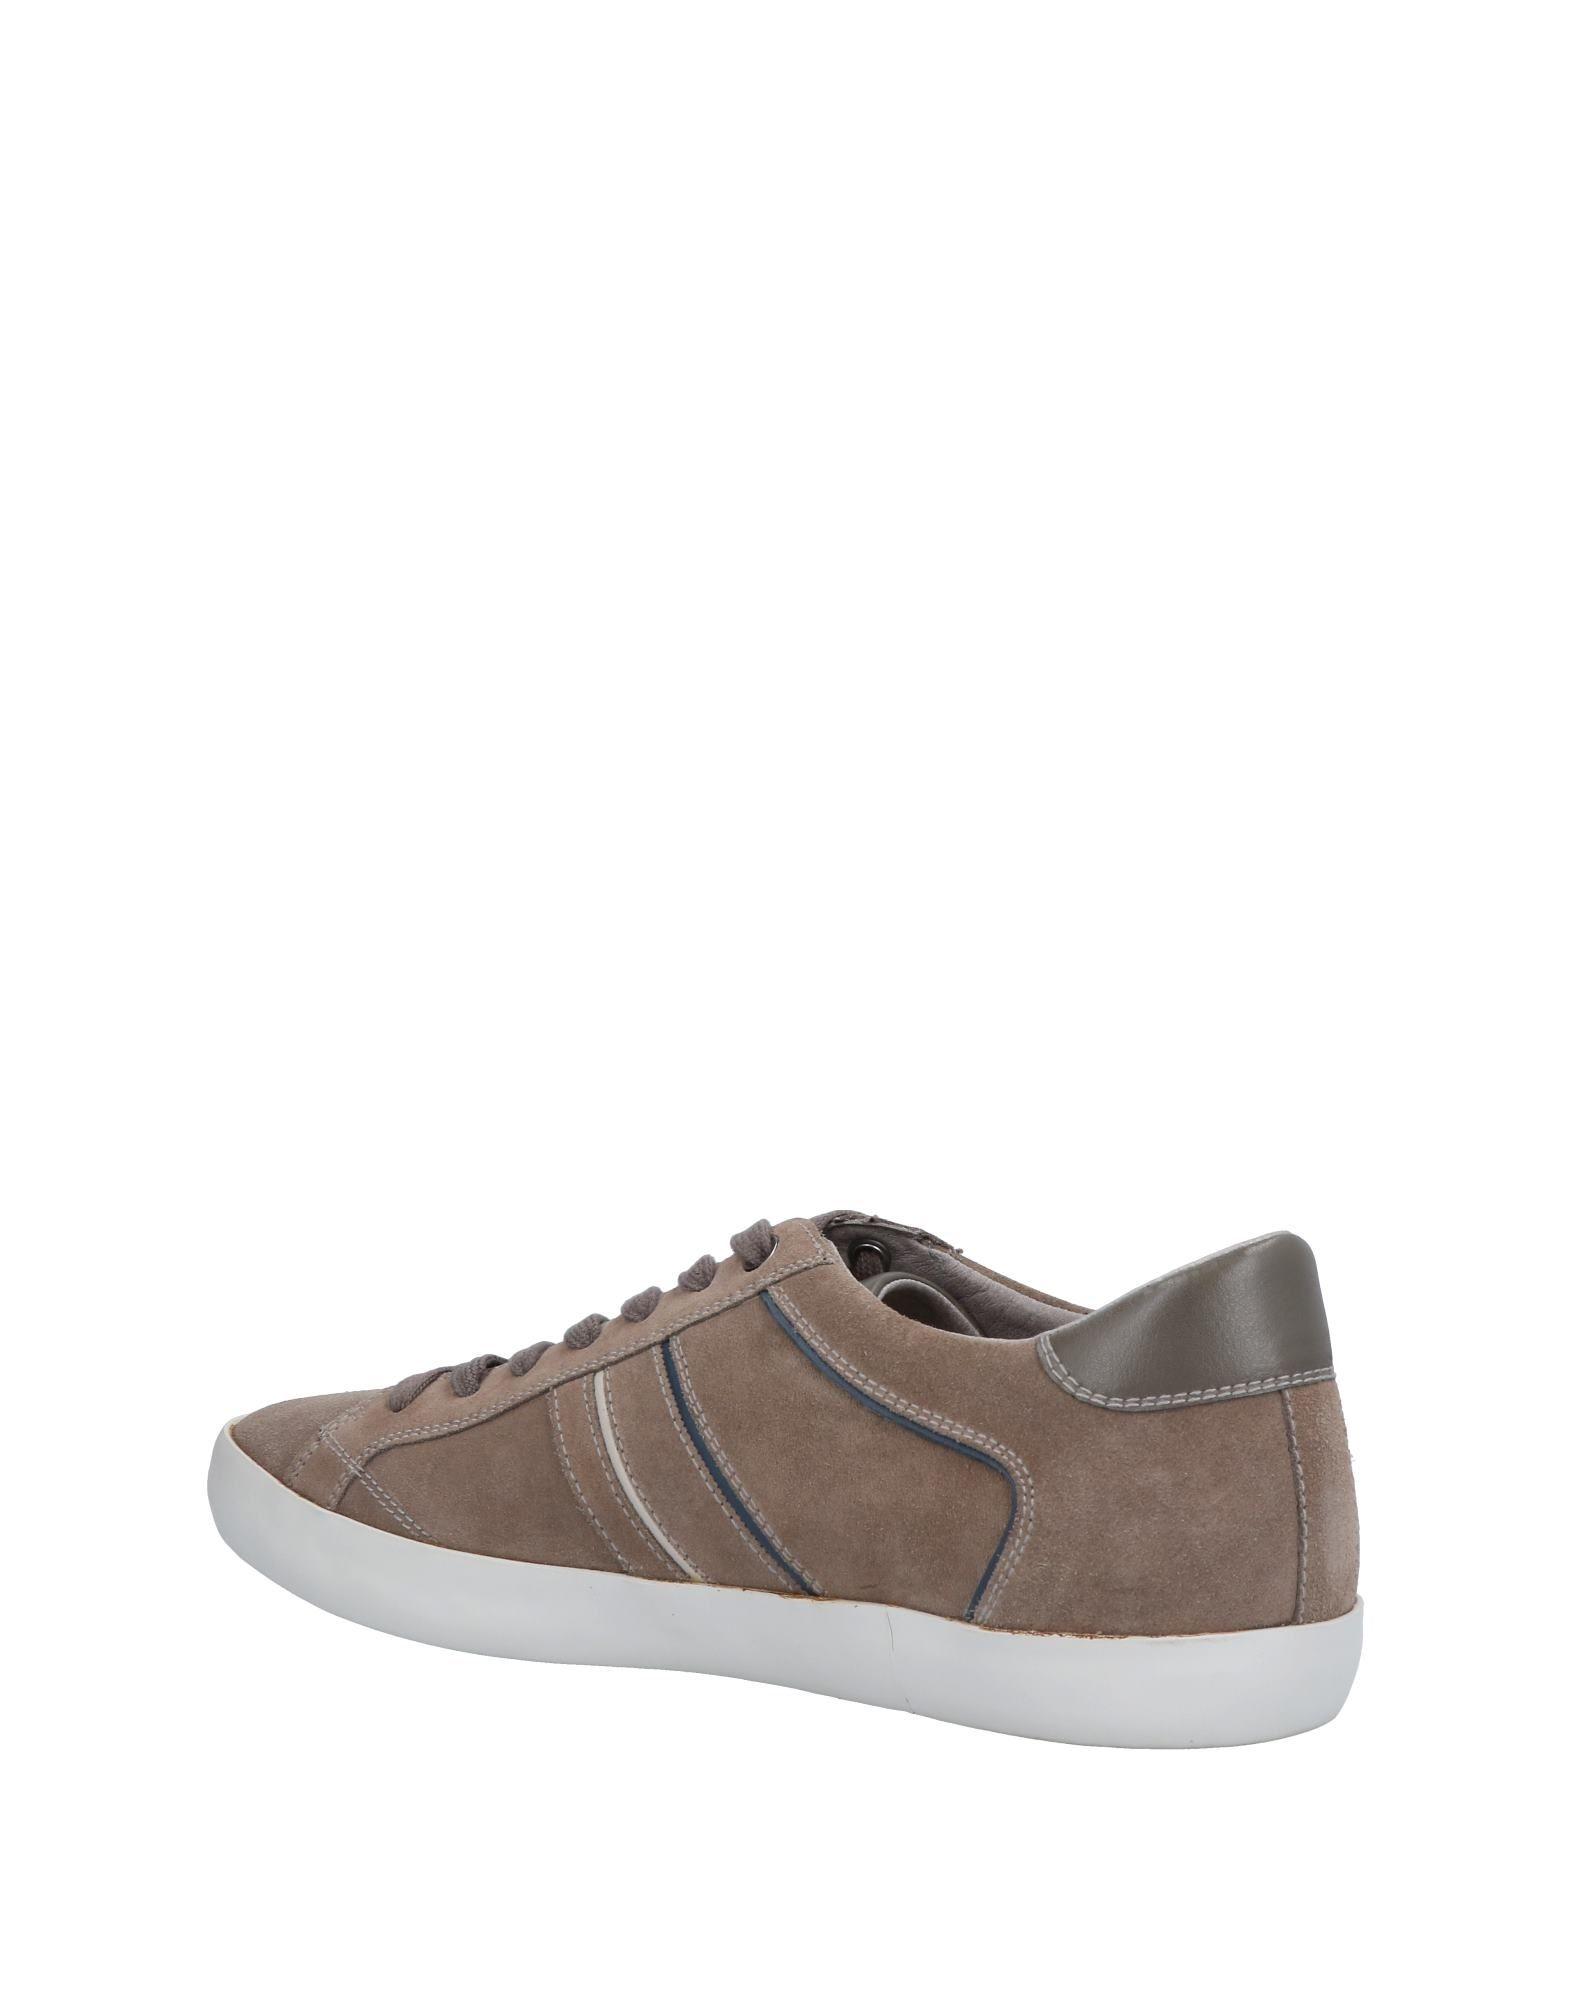 Moda Sneakers Geox Uomo - 11466239QV